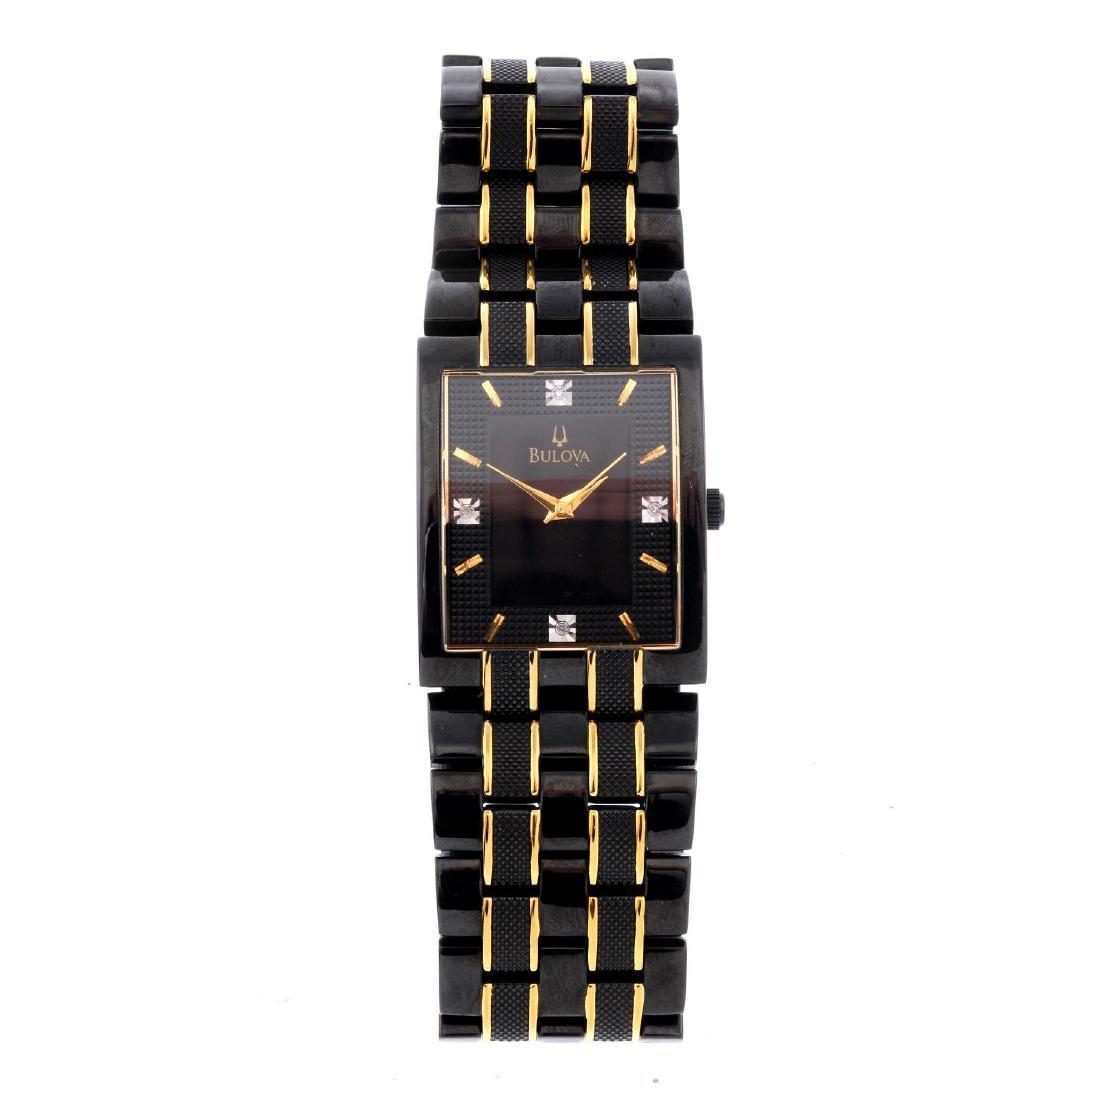 BULOVA - a gentleman's bracelet watch. PVD-treated